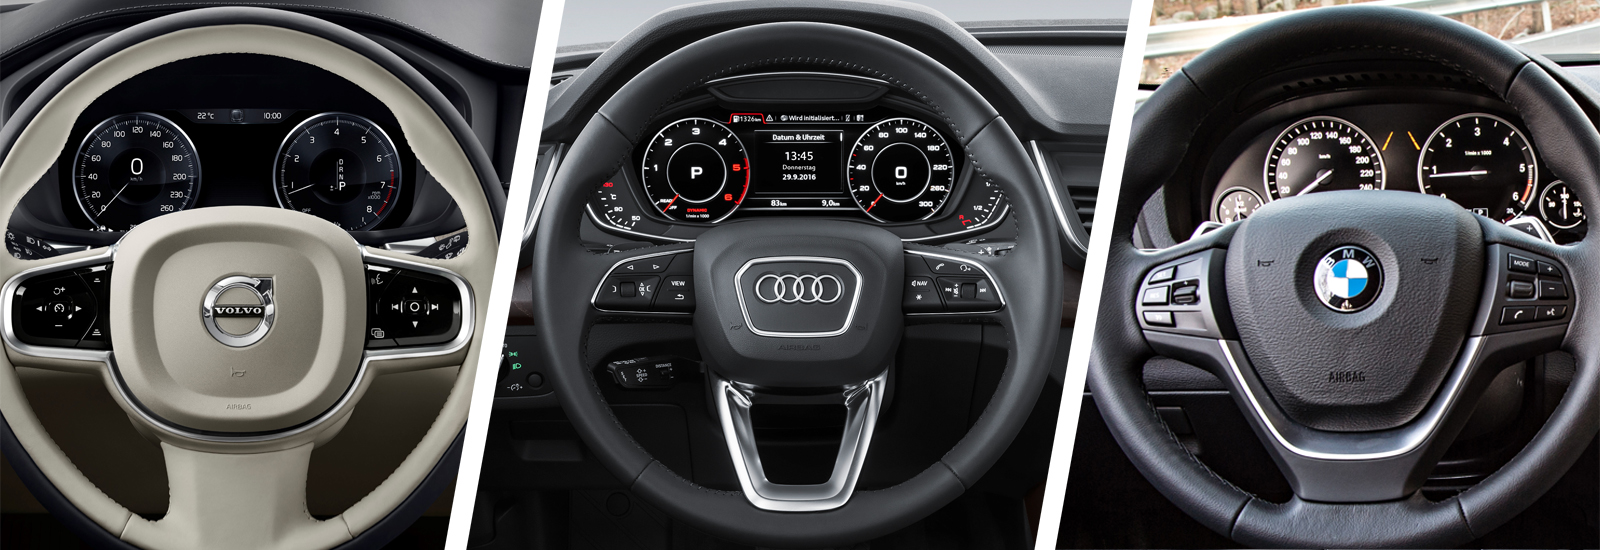 Volvo Xc Vs Audi Q Vs Bmw X Engines